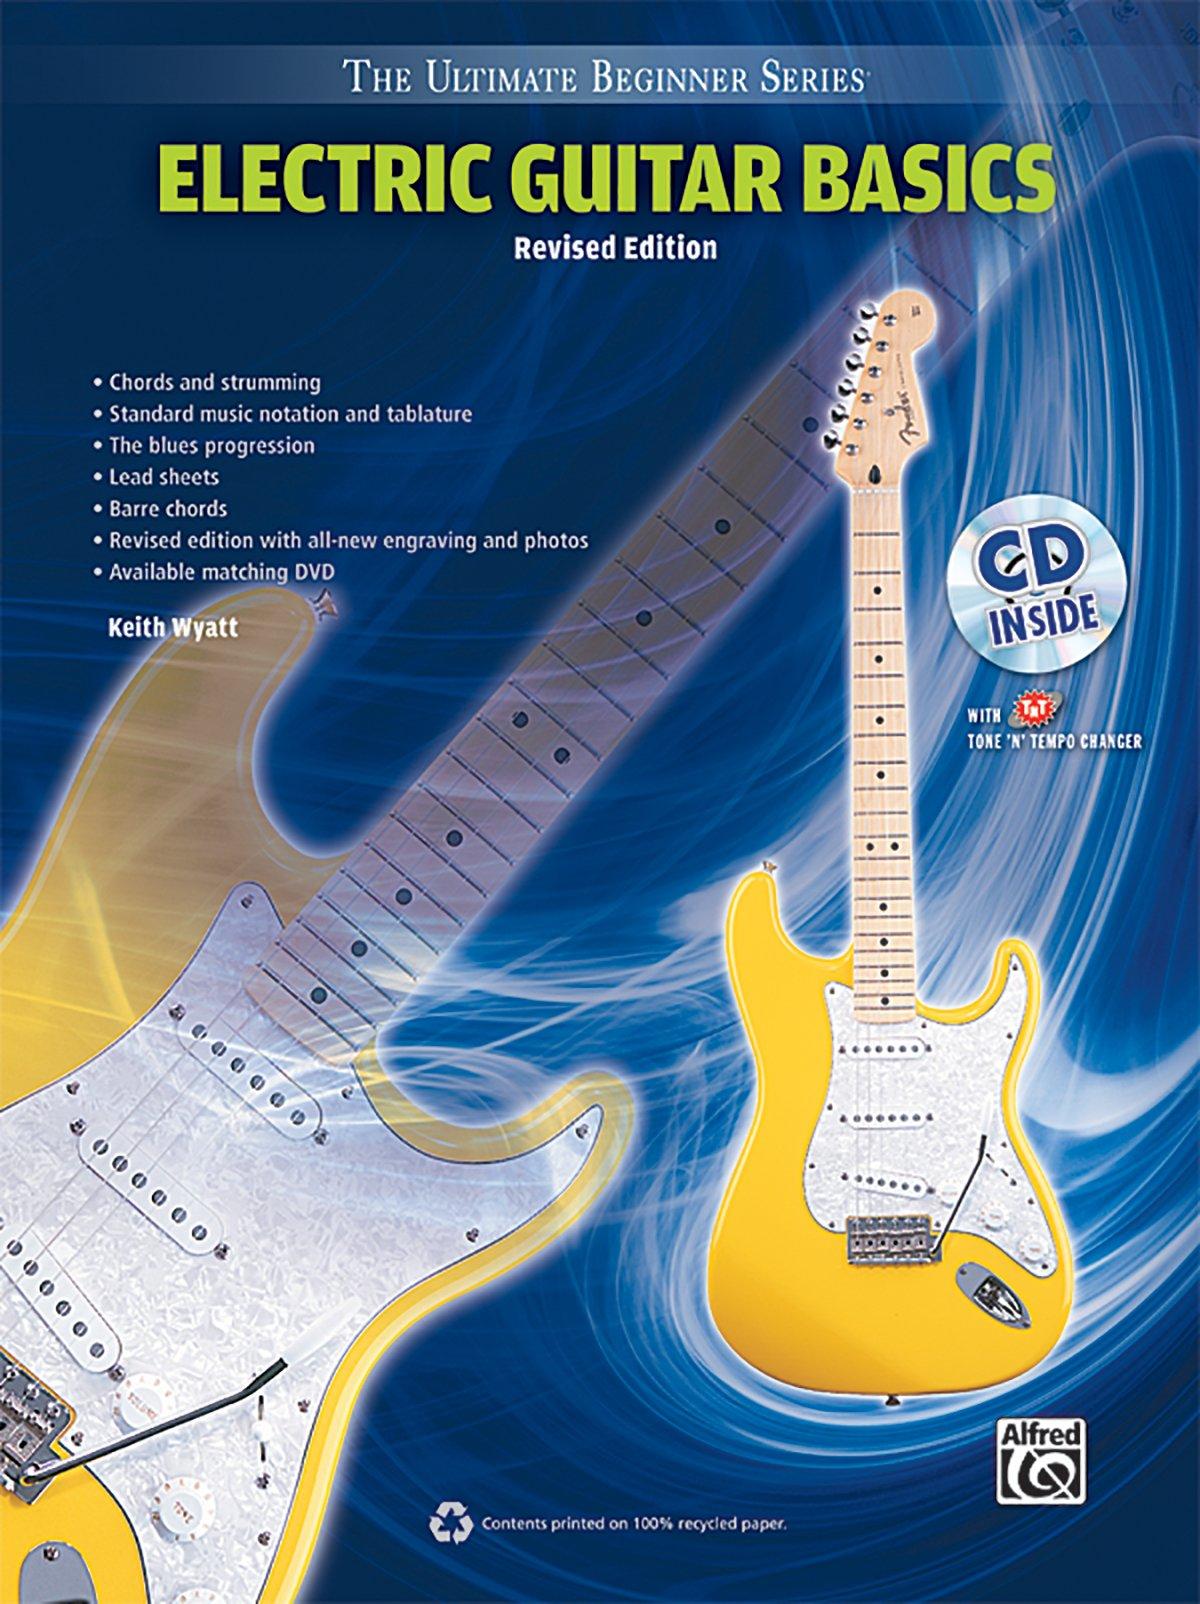 Ultimate Beginner Series Electric Guitar Basics Revised Edition